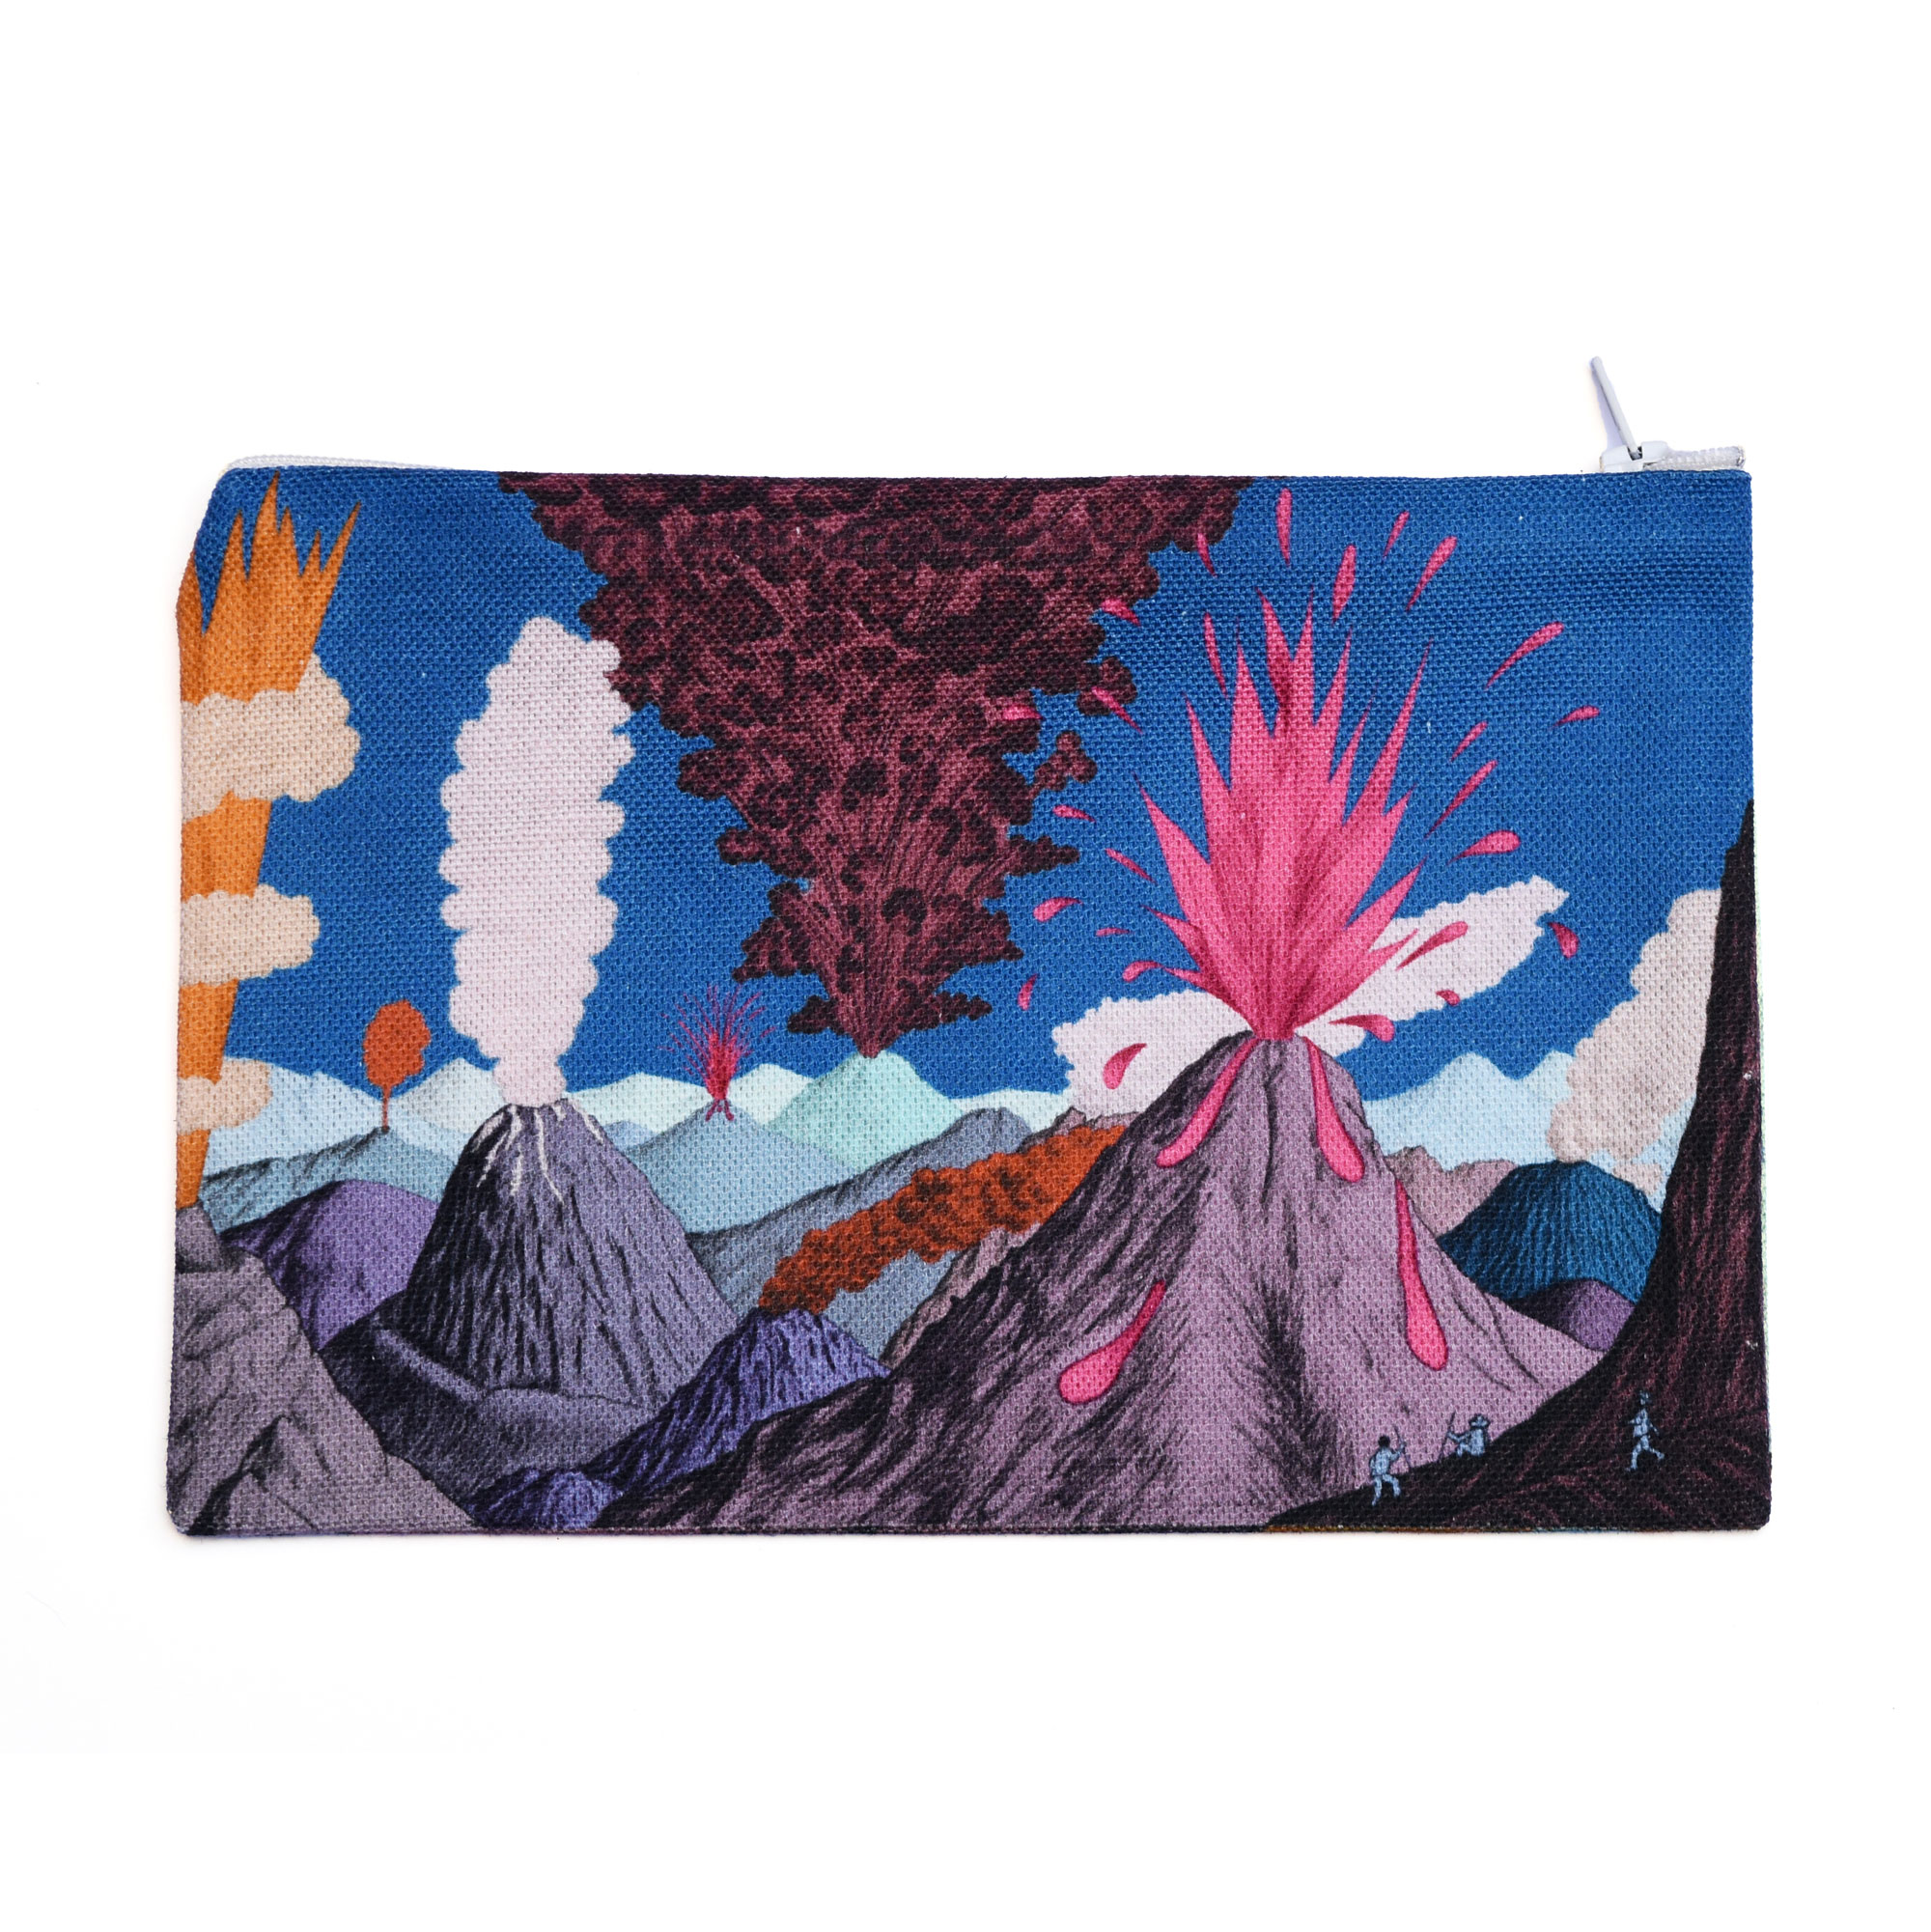 Pochette en tissu sur fond blanc, motif Volcans ciel bleu